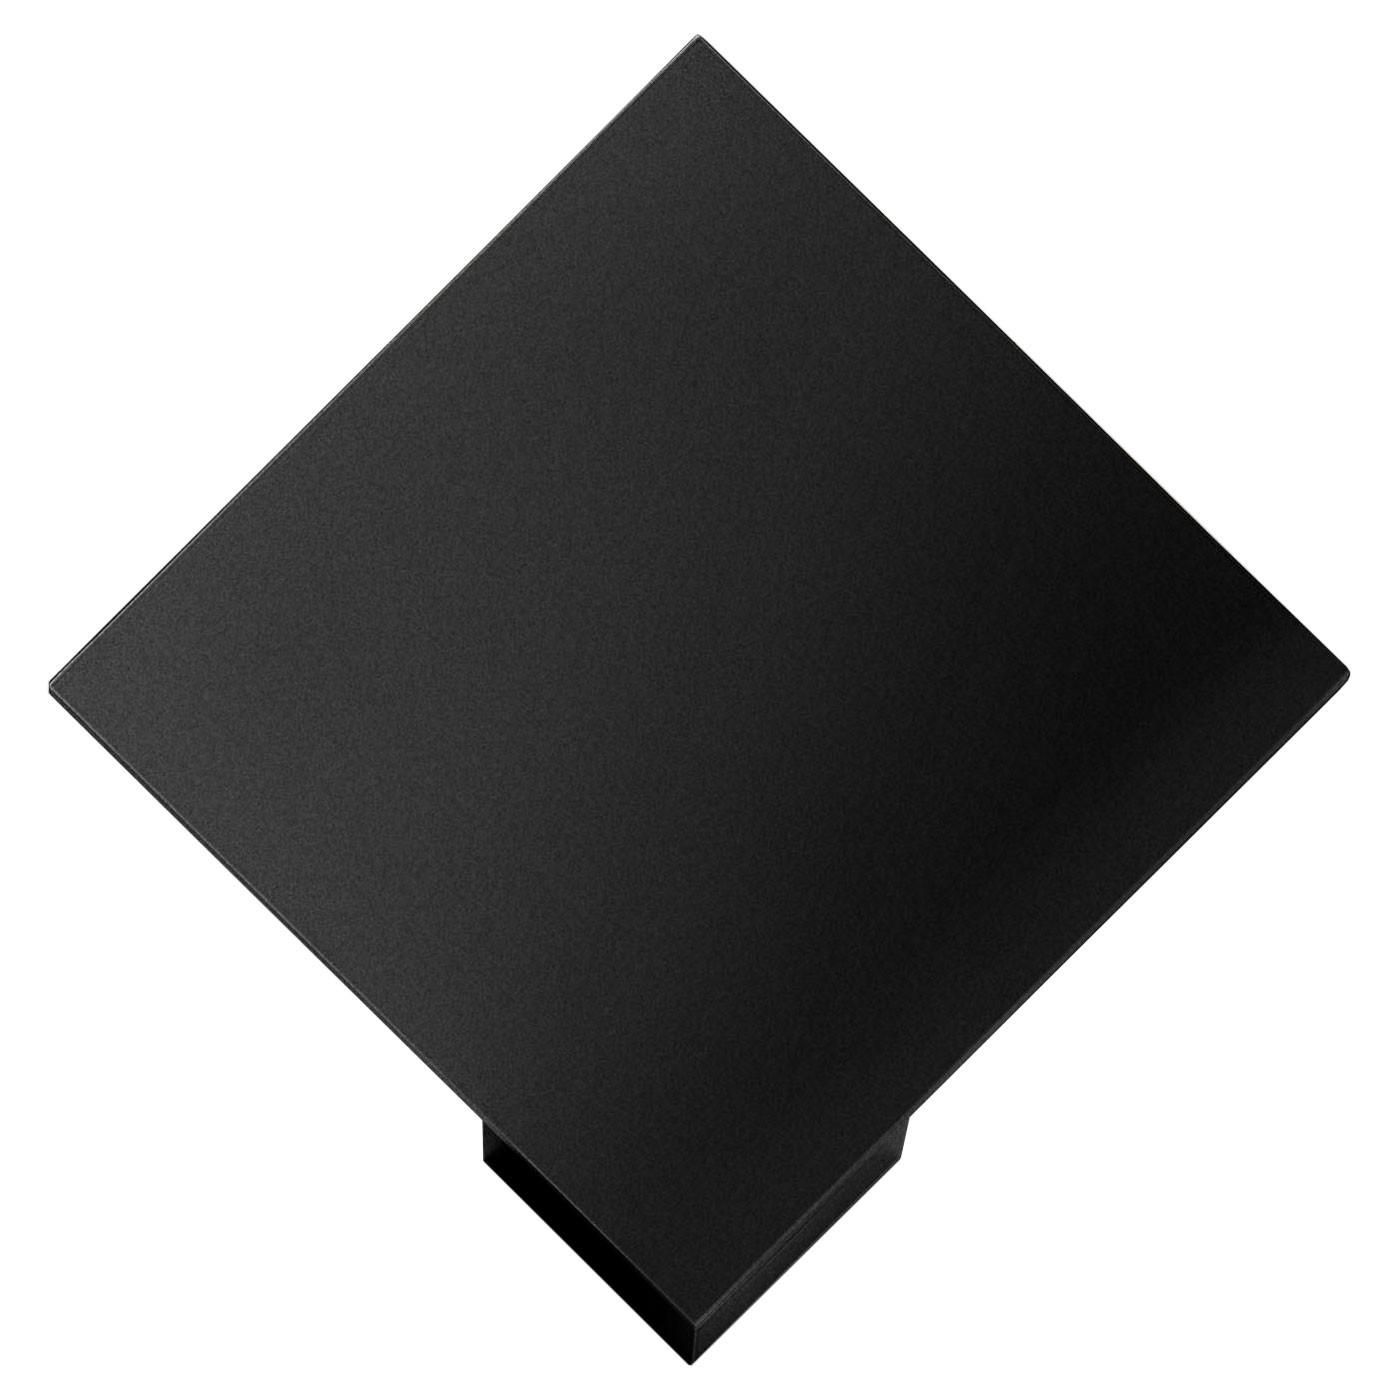 Lodes Puzzle Single Square